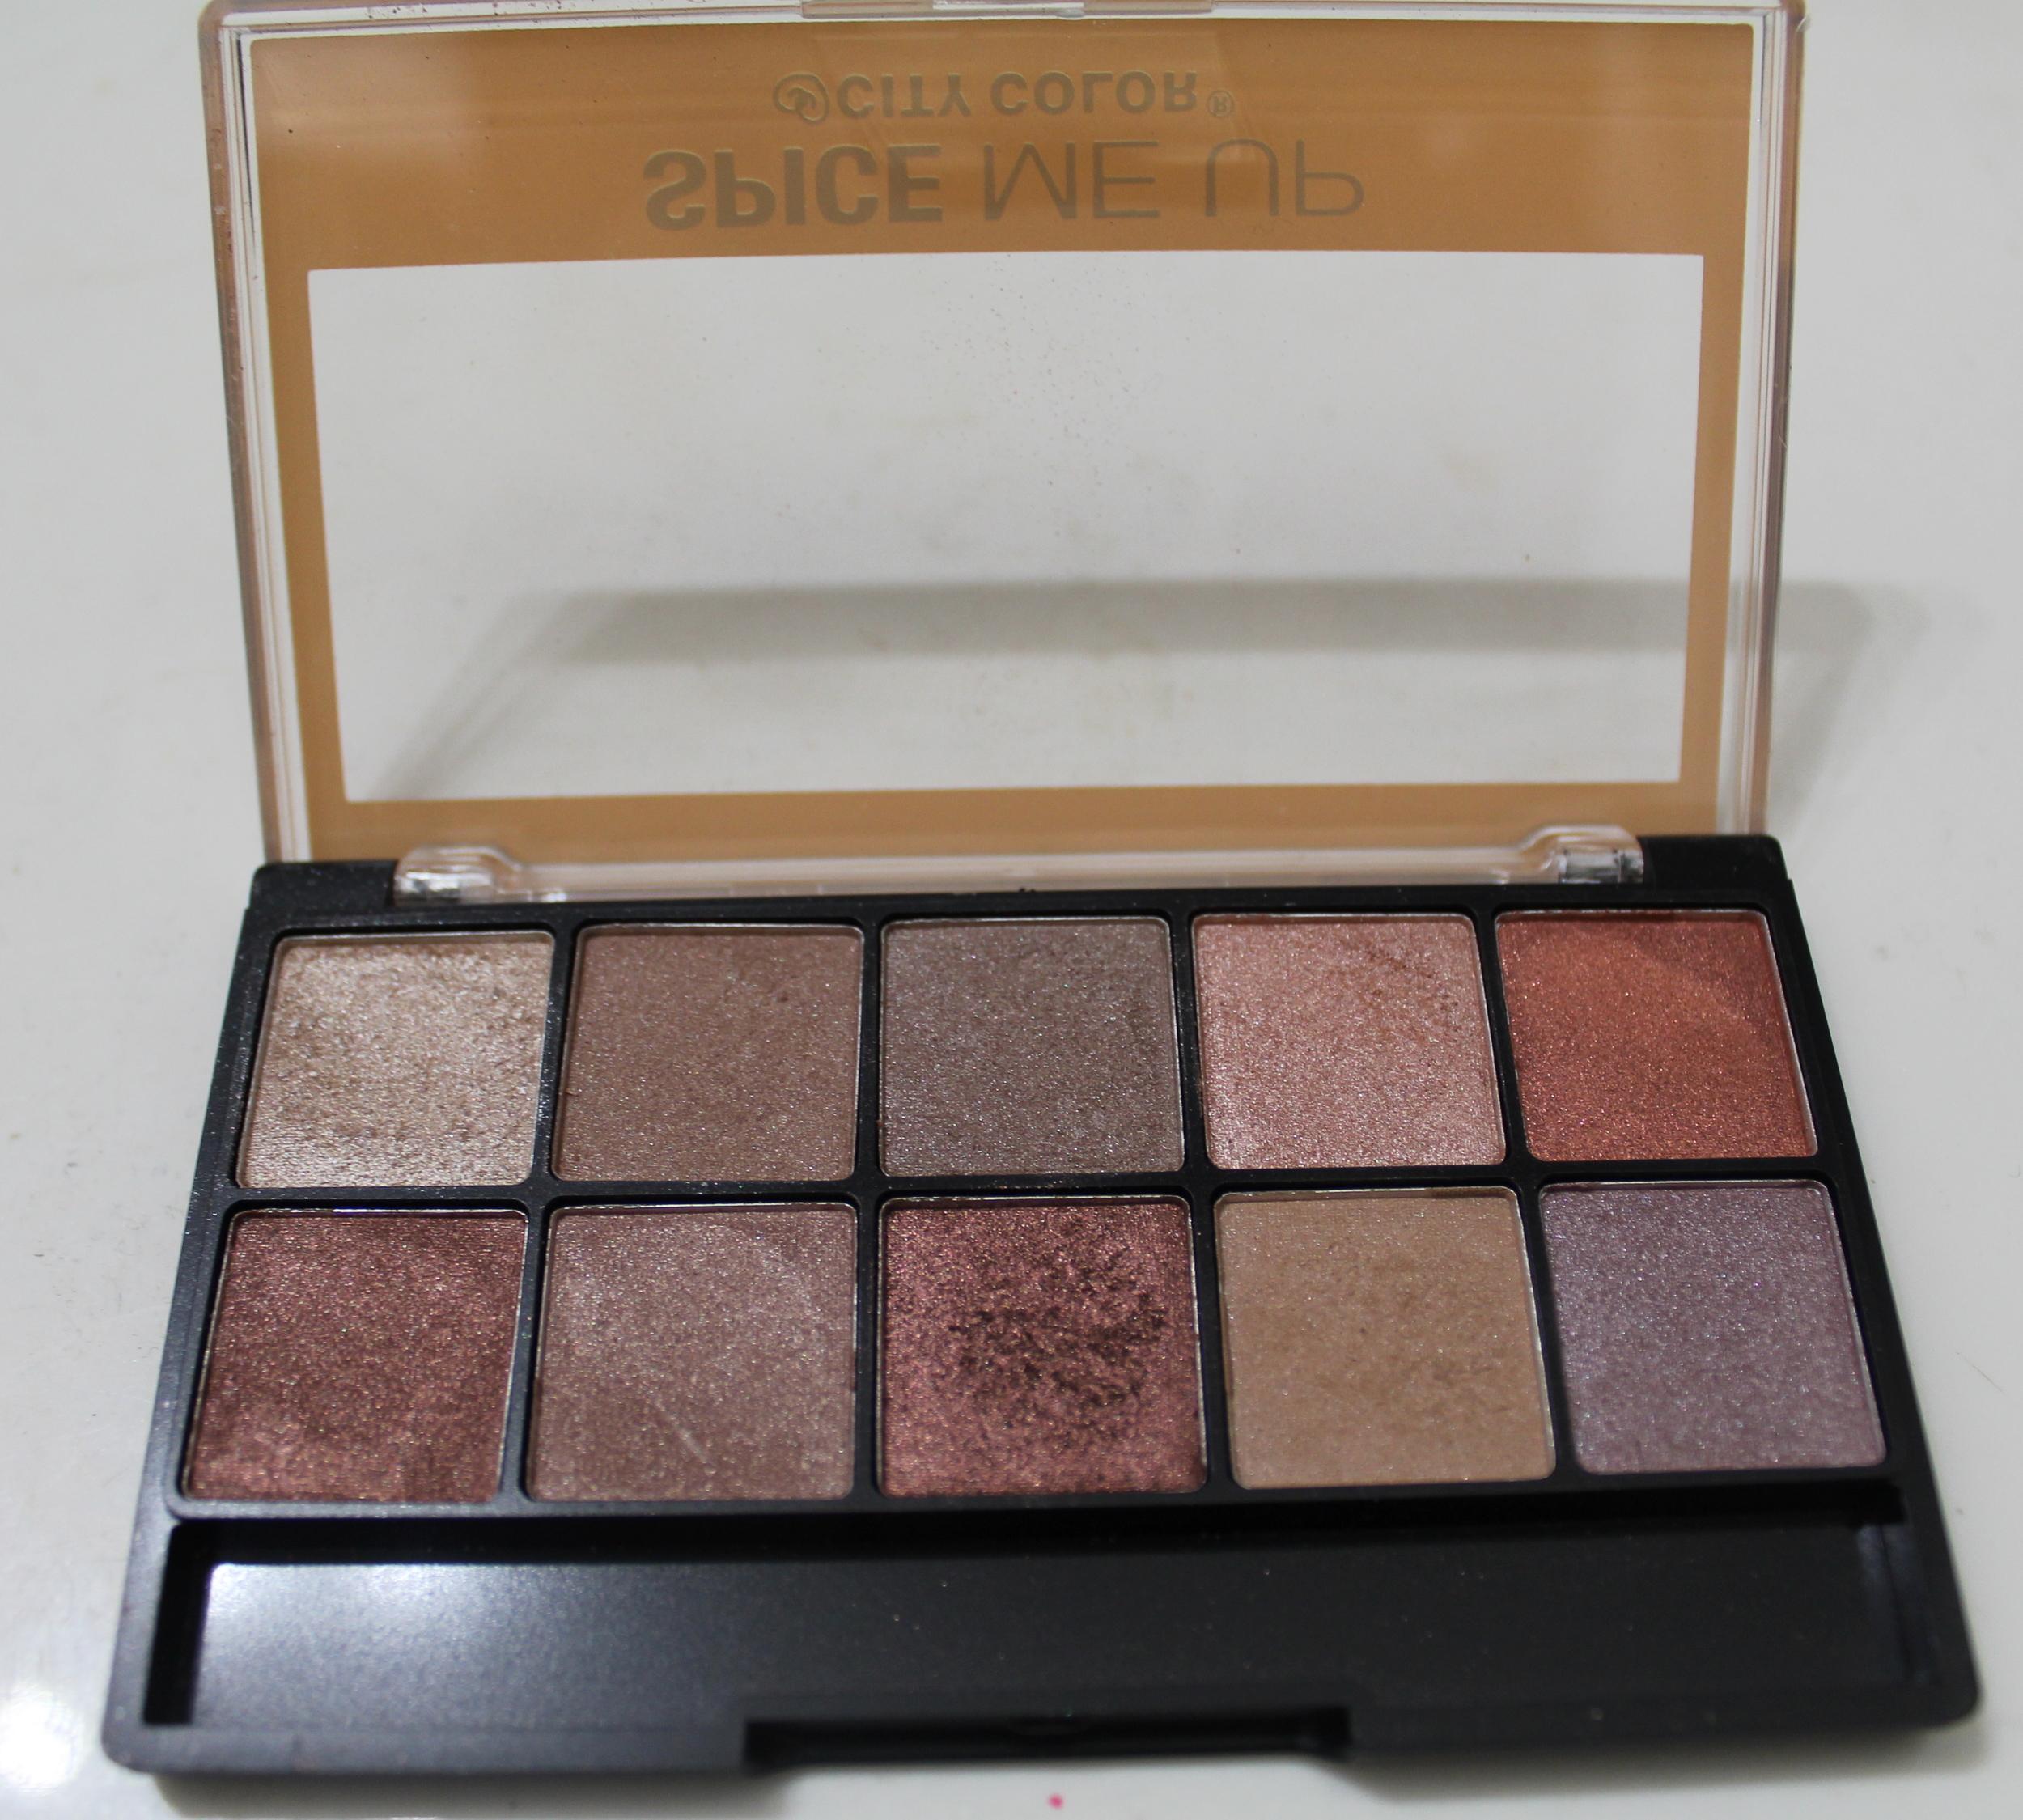 Spice Me Up Palette - $8.99